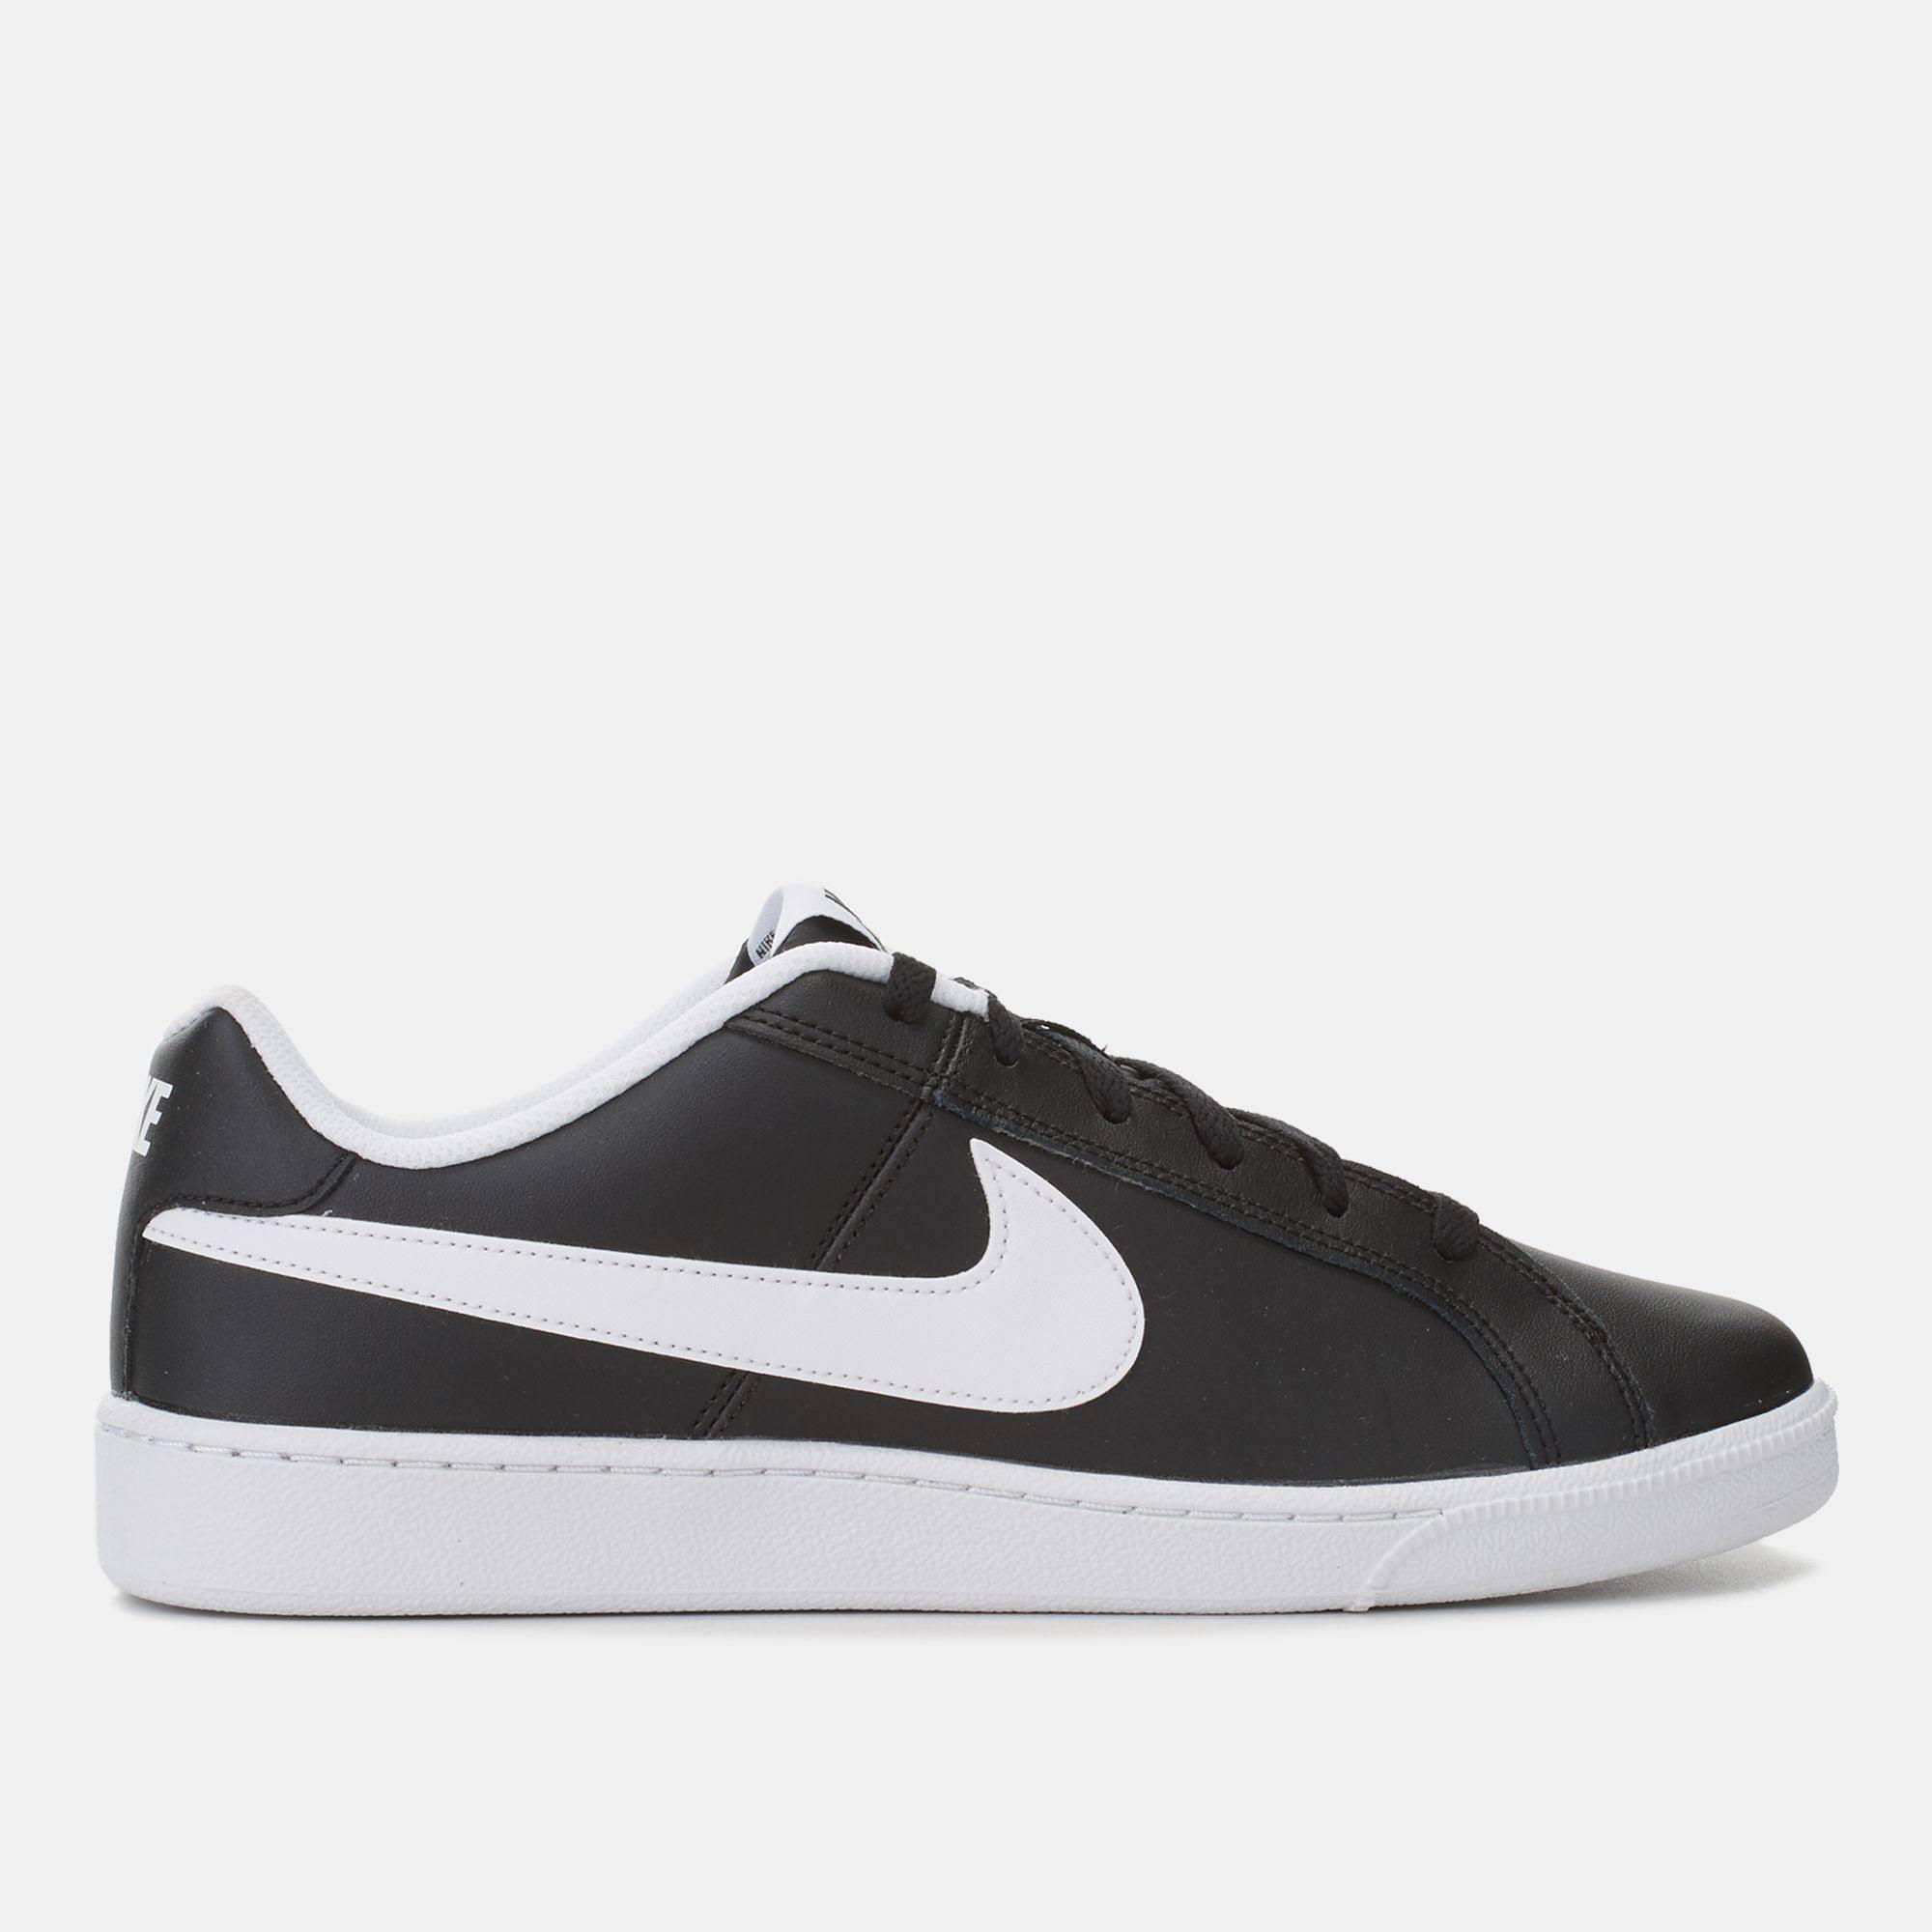 Court Nike Noir Noir 44 Royale Hommes Sneakers Blanc En wrS1OErx